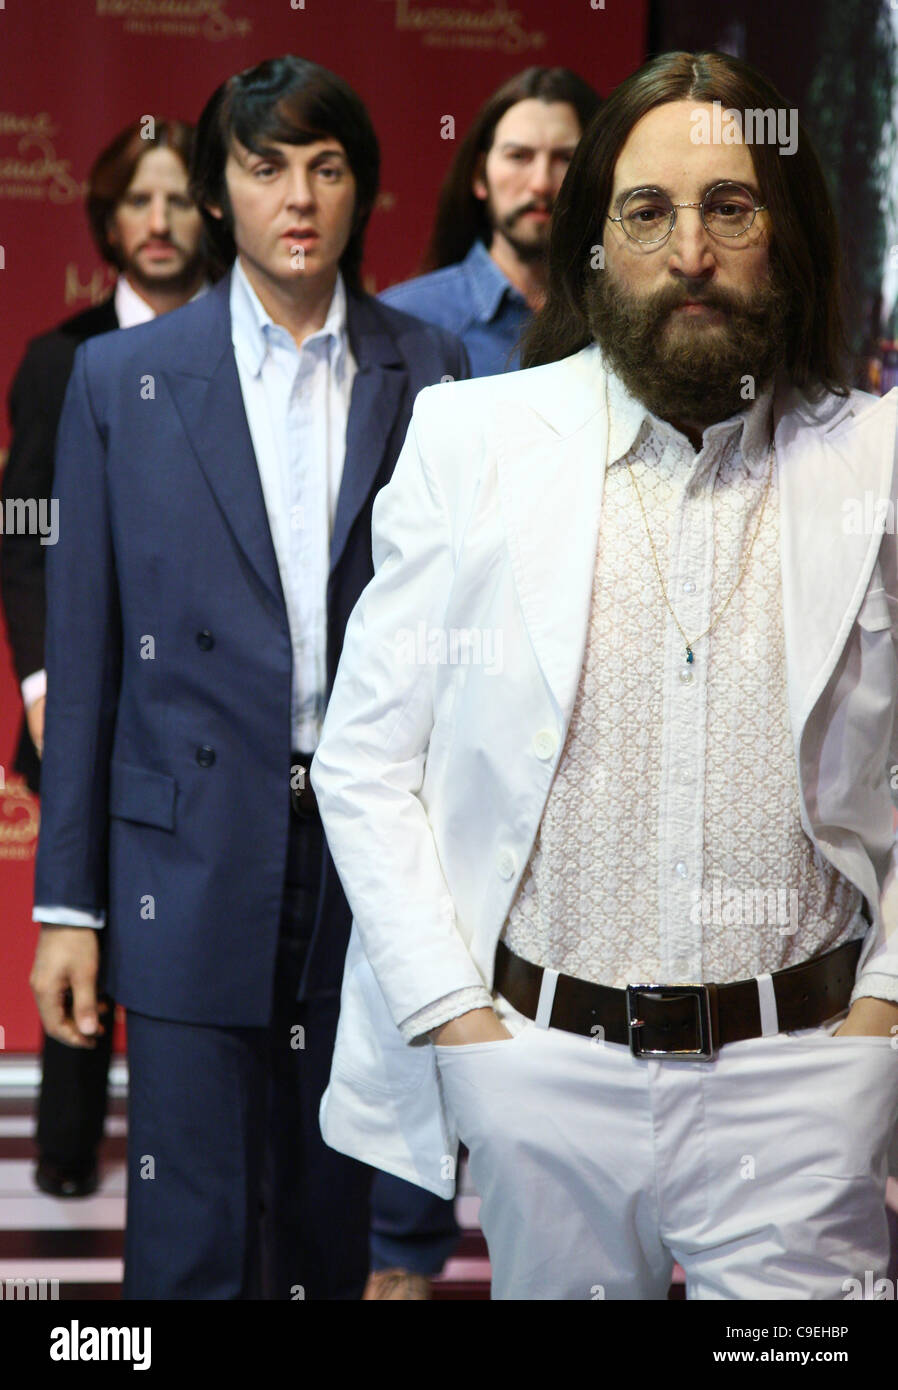 RINGO STARR & GEORGE HARRISON & PAUL MCCARTNEY & JOHN LENNON THE BEATLES WAX FIGURES UNVEILING HOLLYWOOD - Stock Image